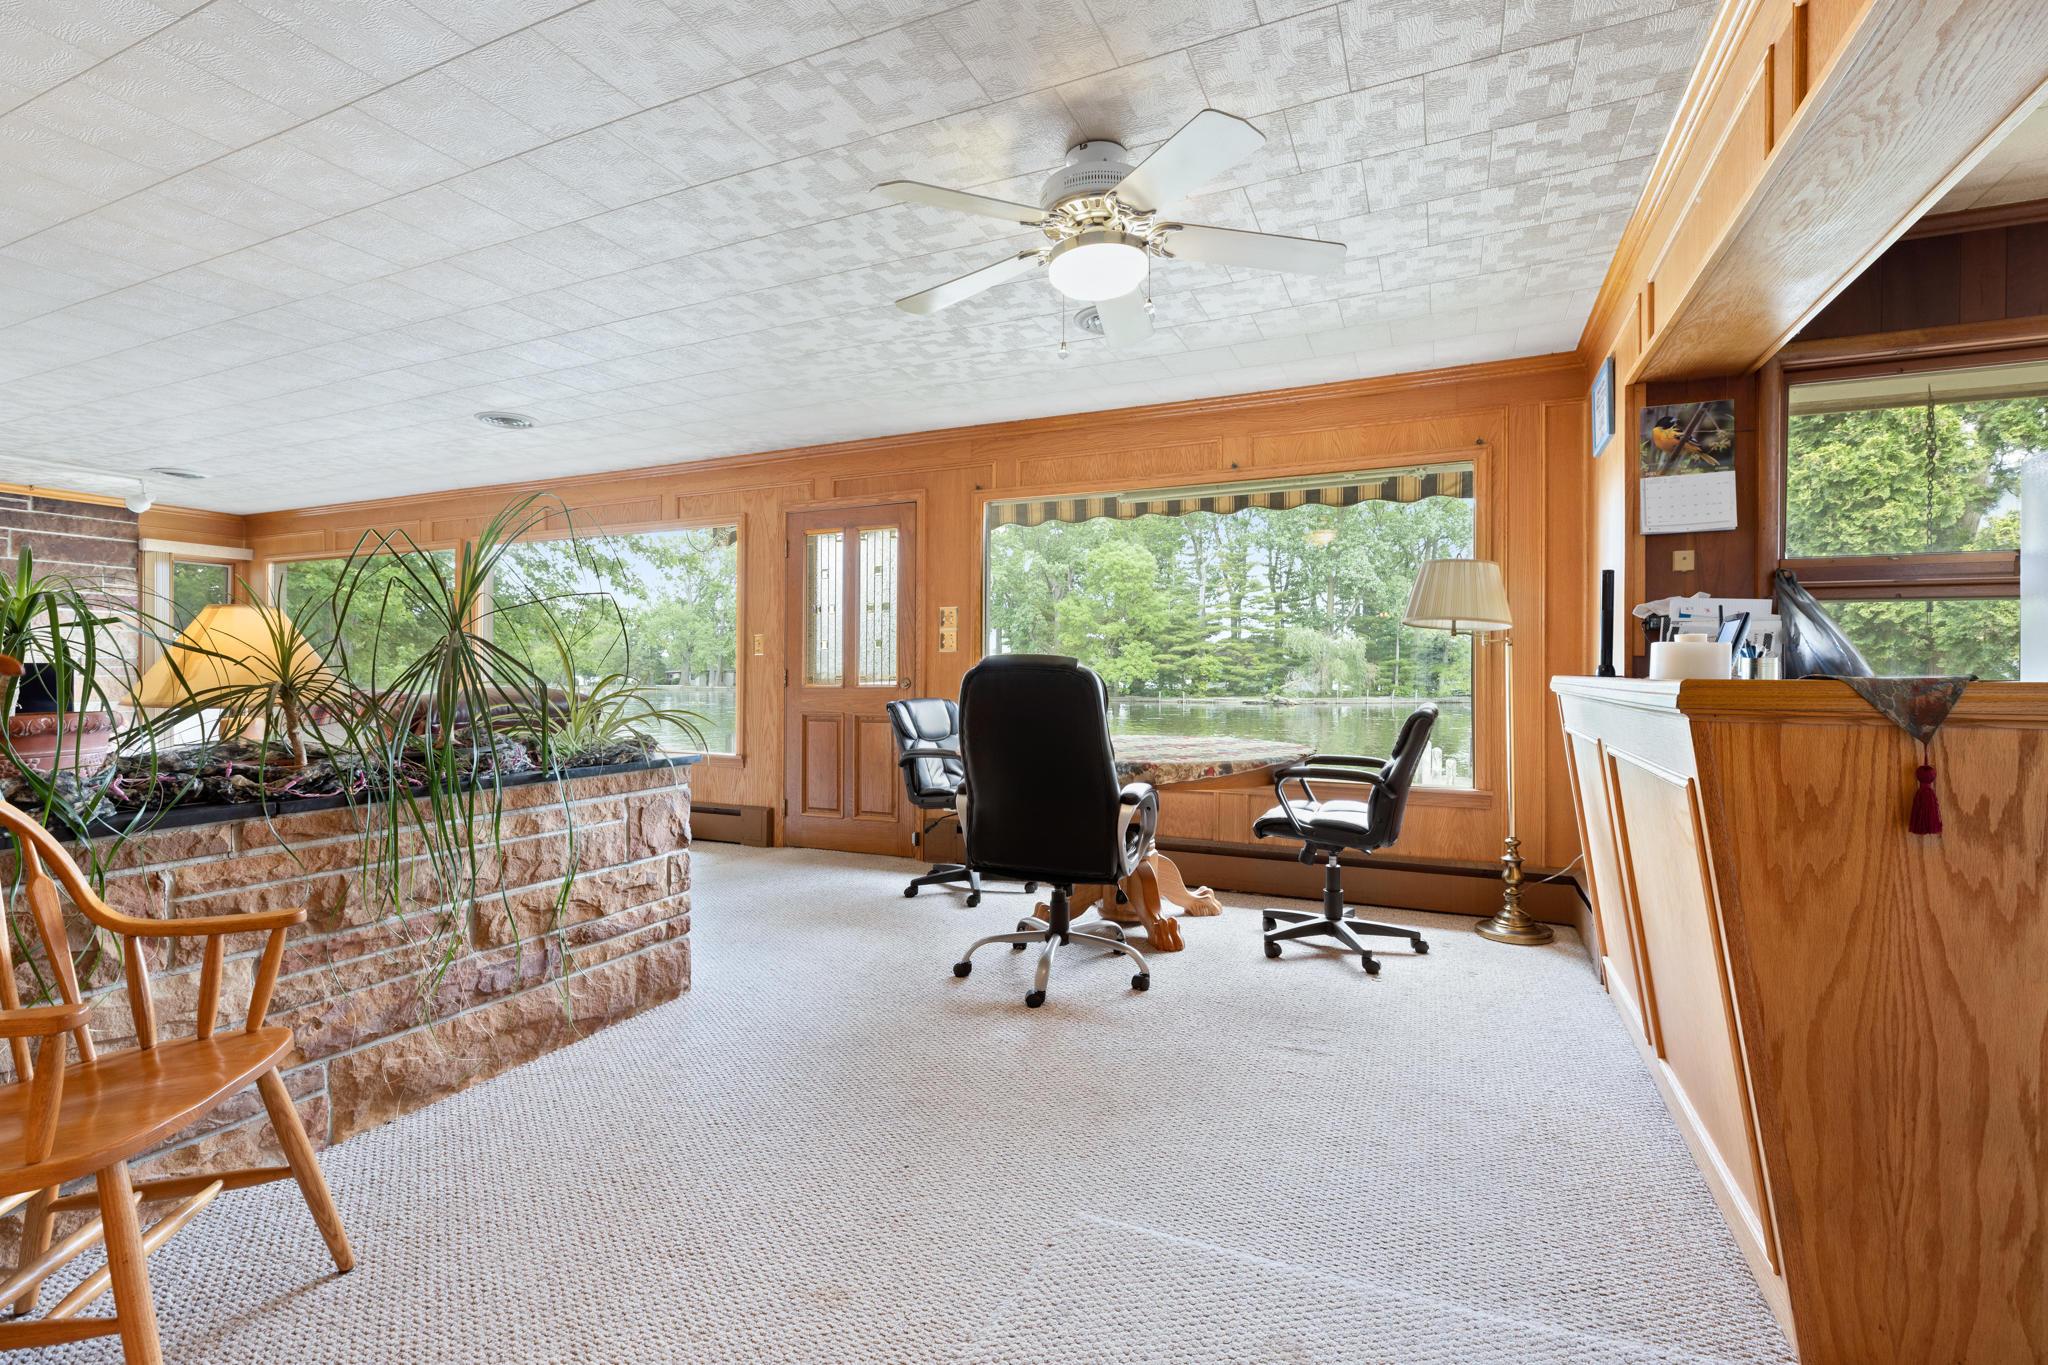 134 Brads Way Property Photo 14